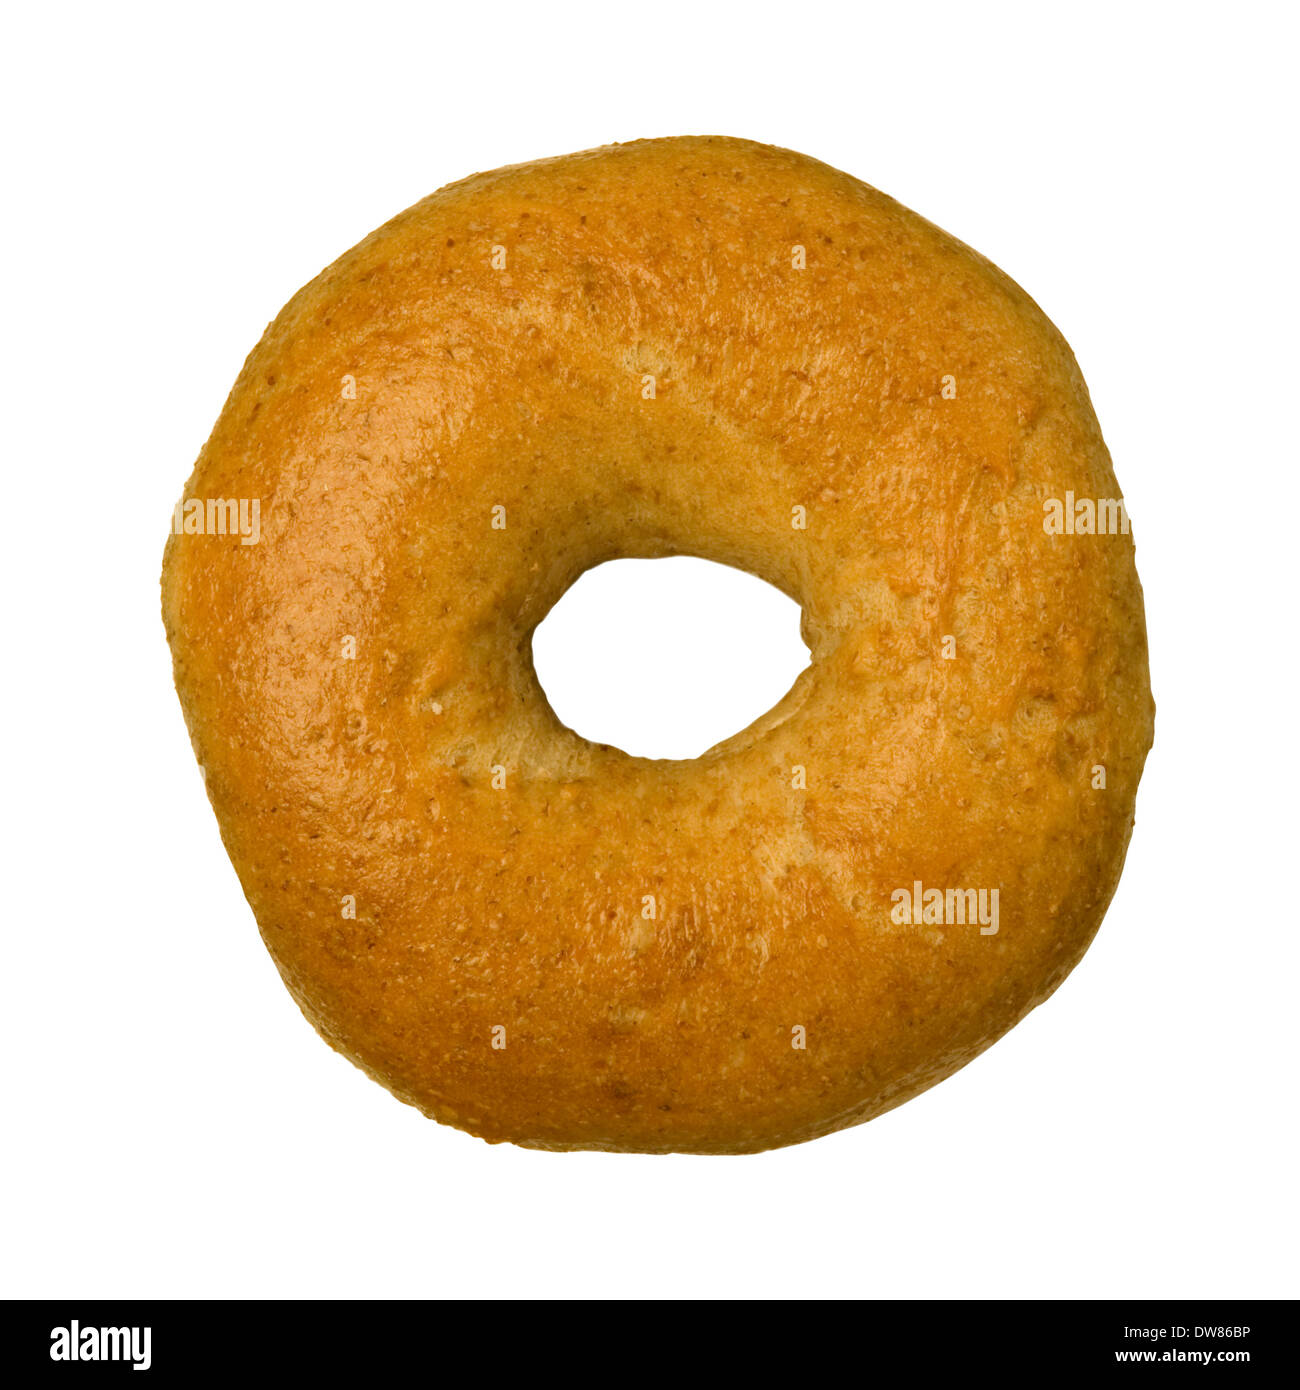 Whole wheat bagel isolated against white background - Stock Image